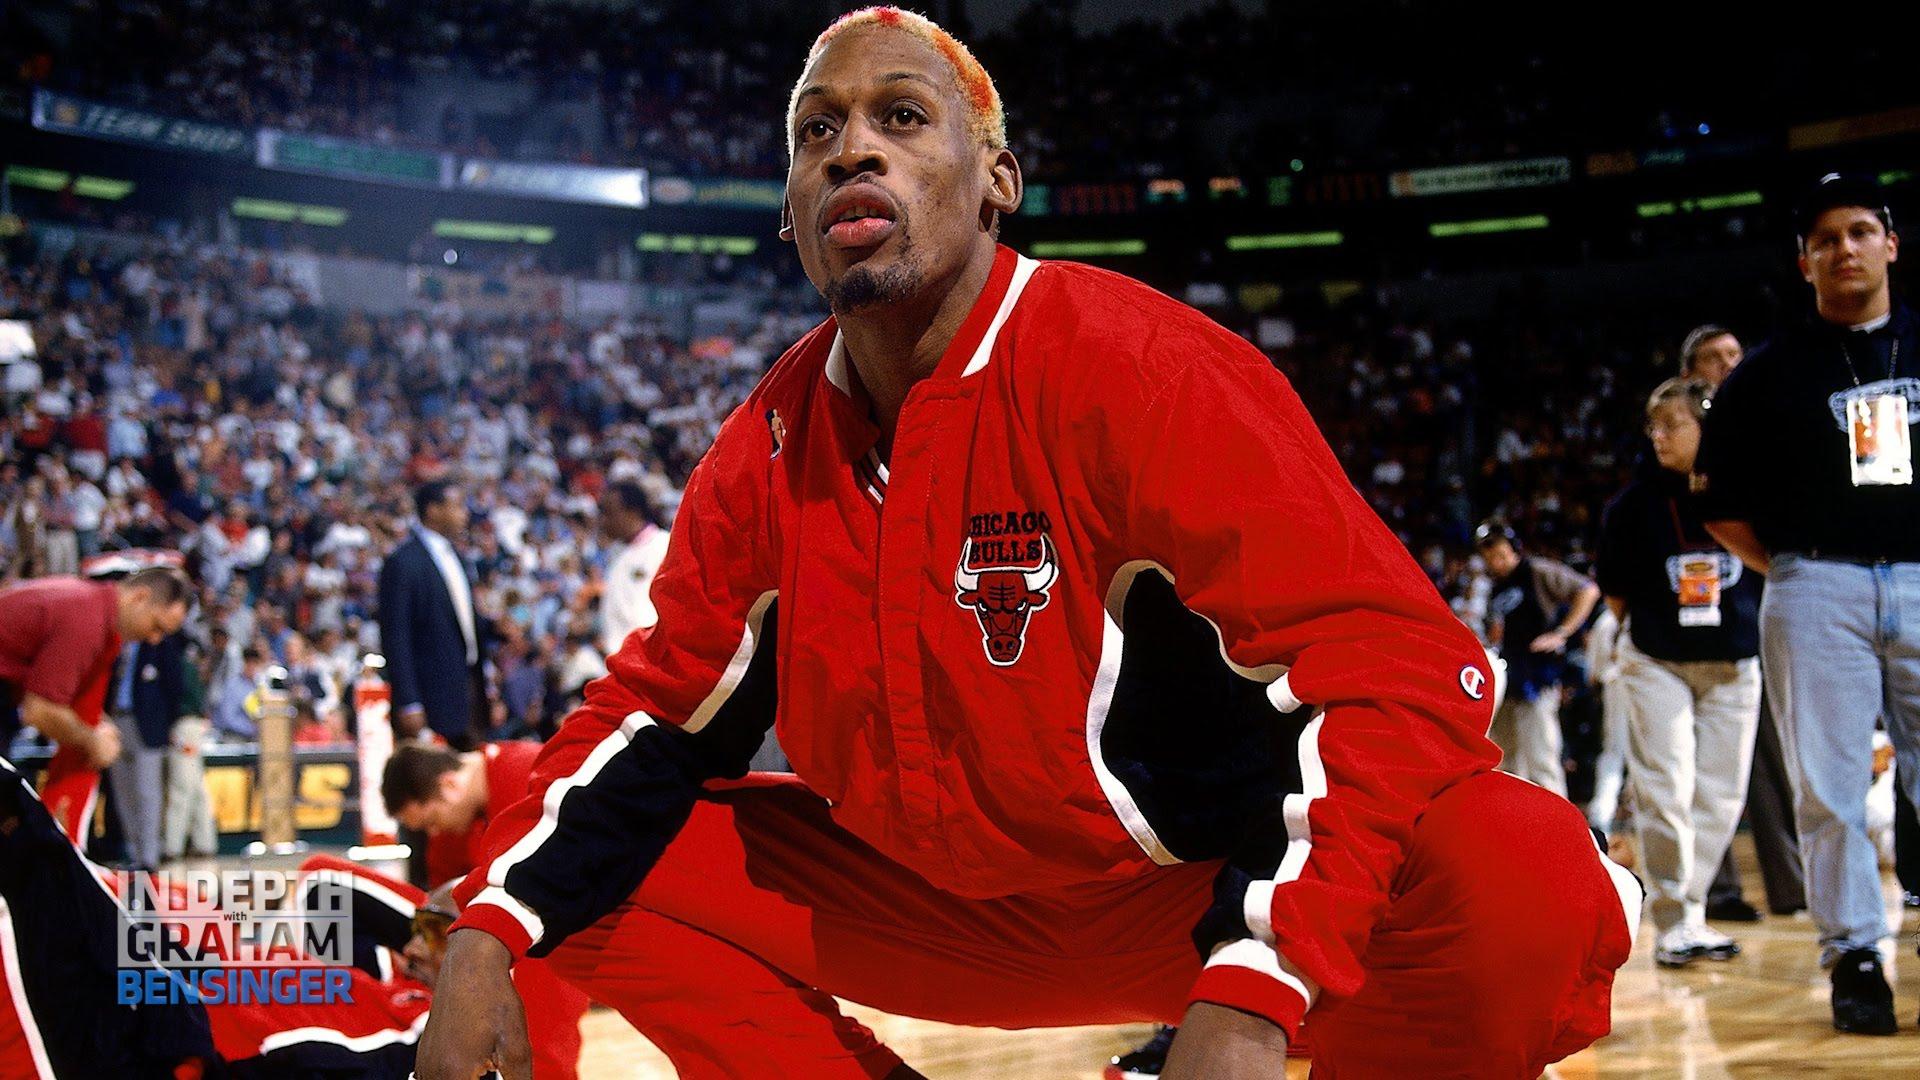 Lebron James Quotes Wallpaper Dennis Rodman Says He Never Talked To Michael Jordan Or